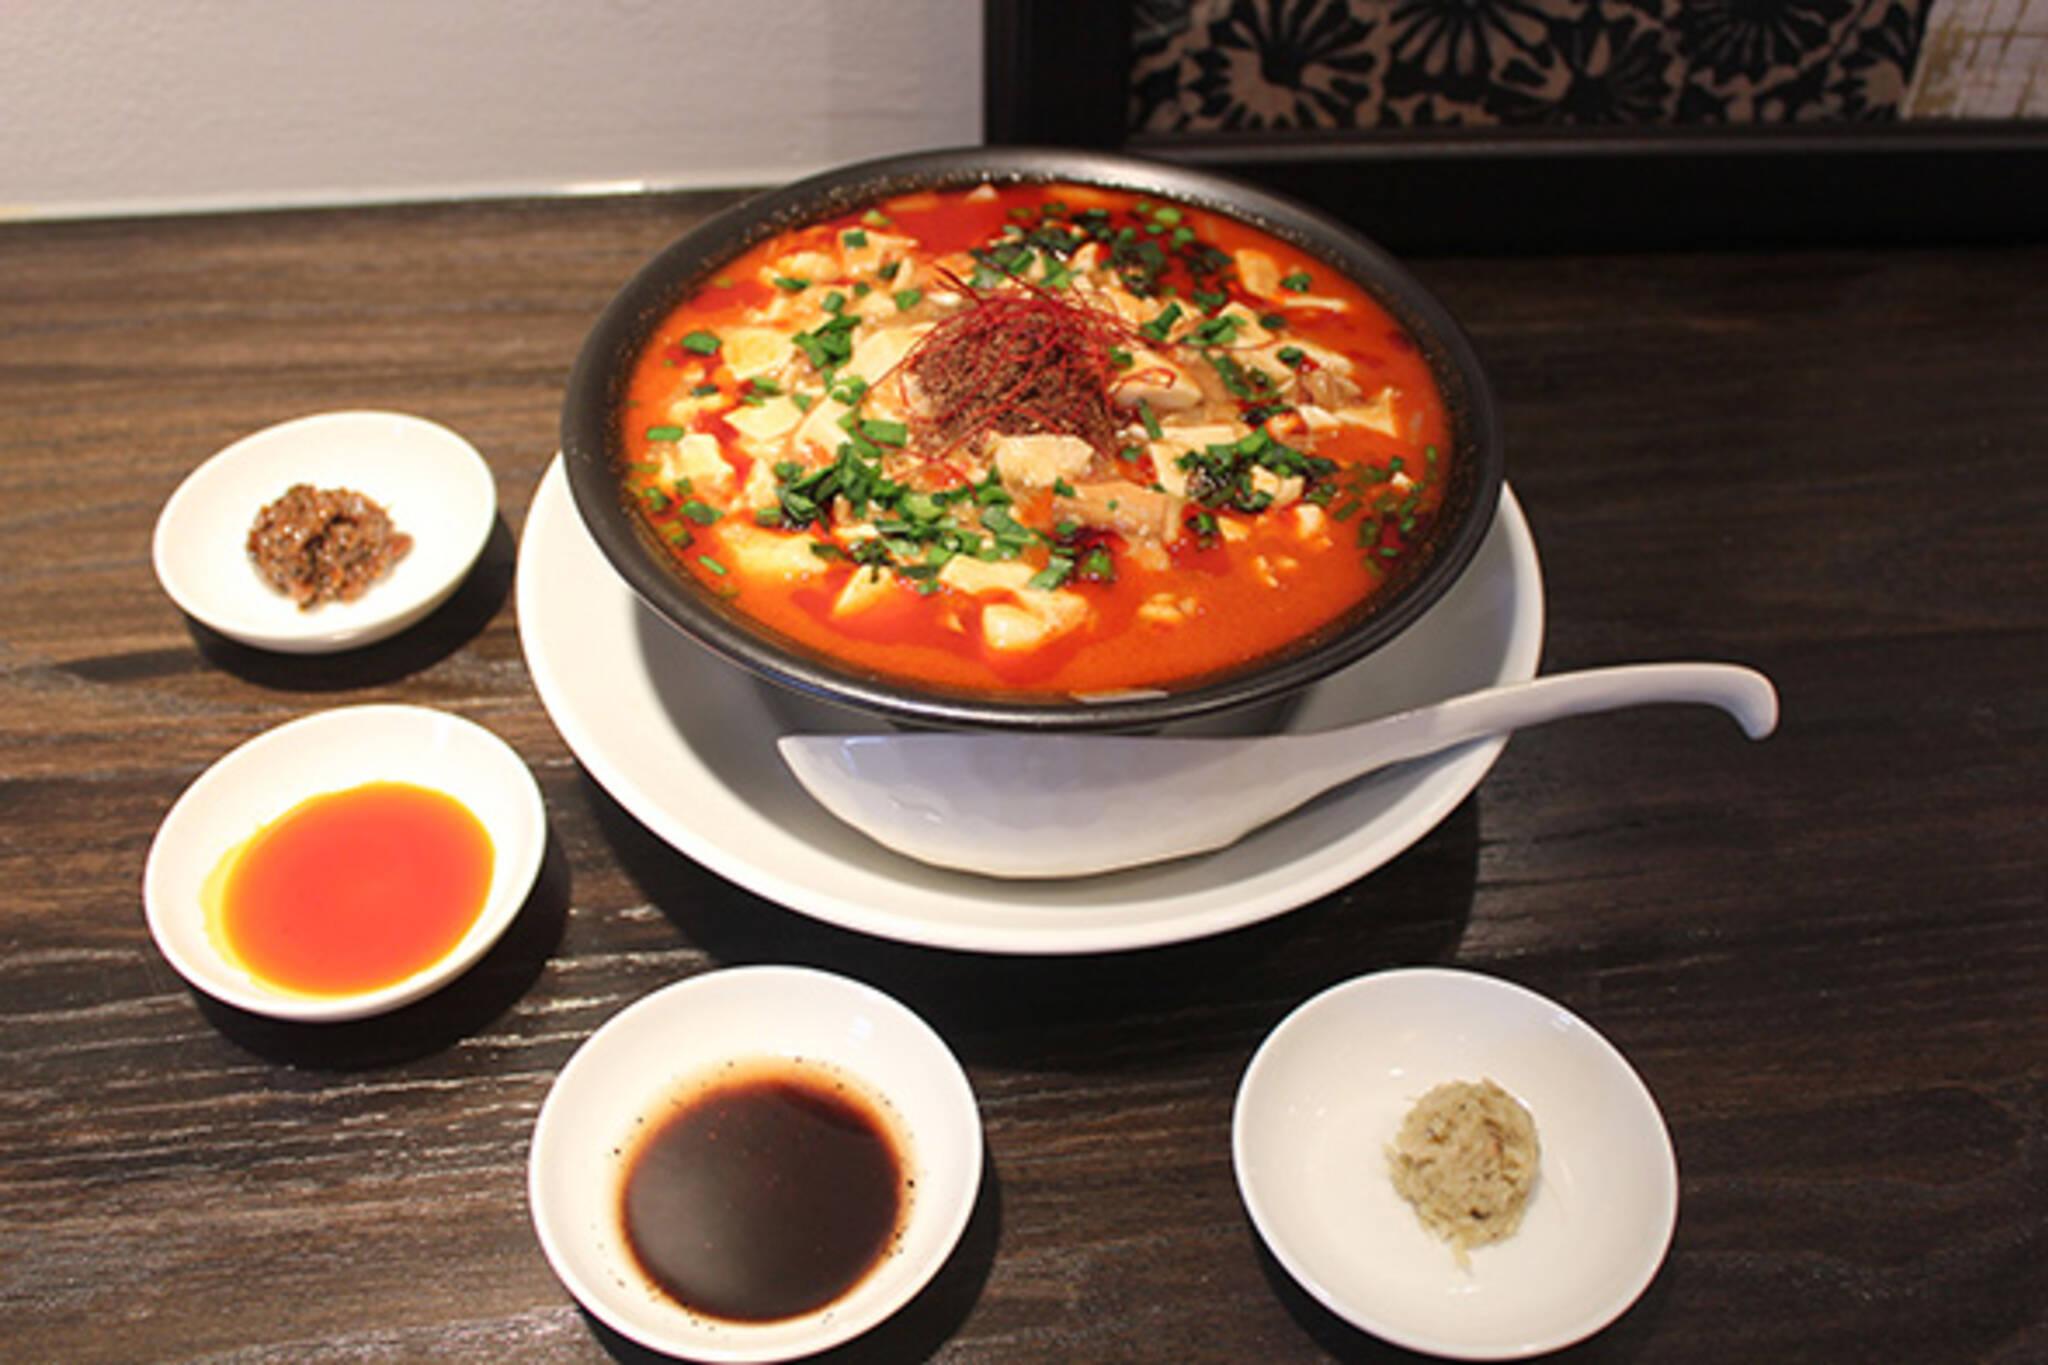 Ryus Noodle Bar